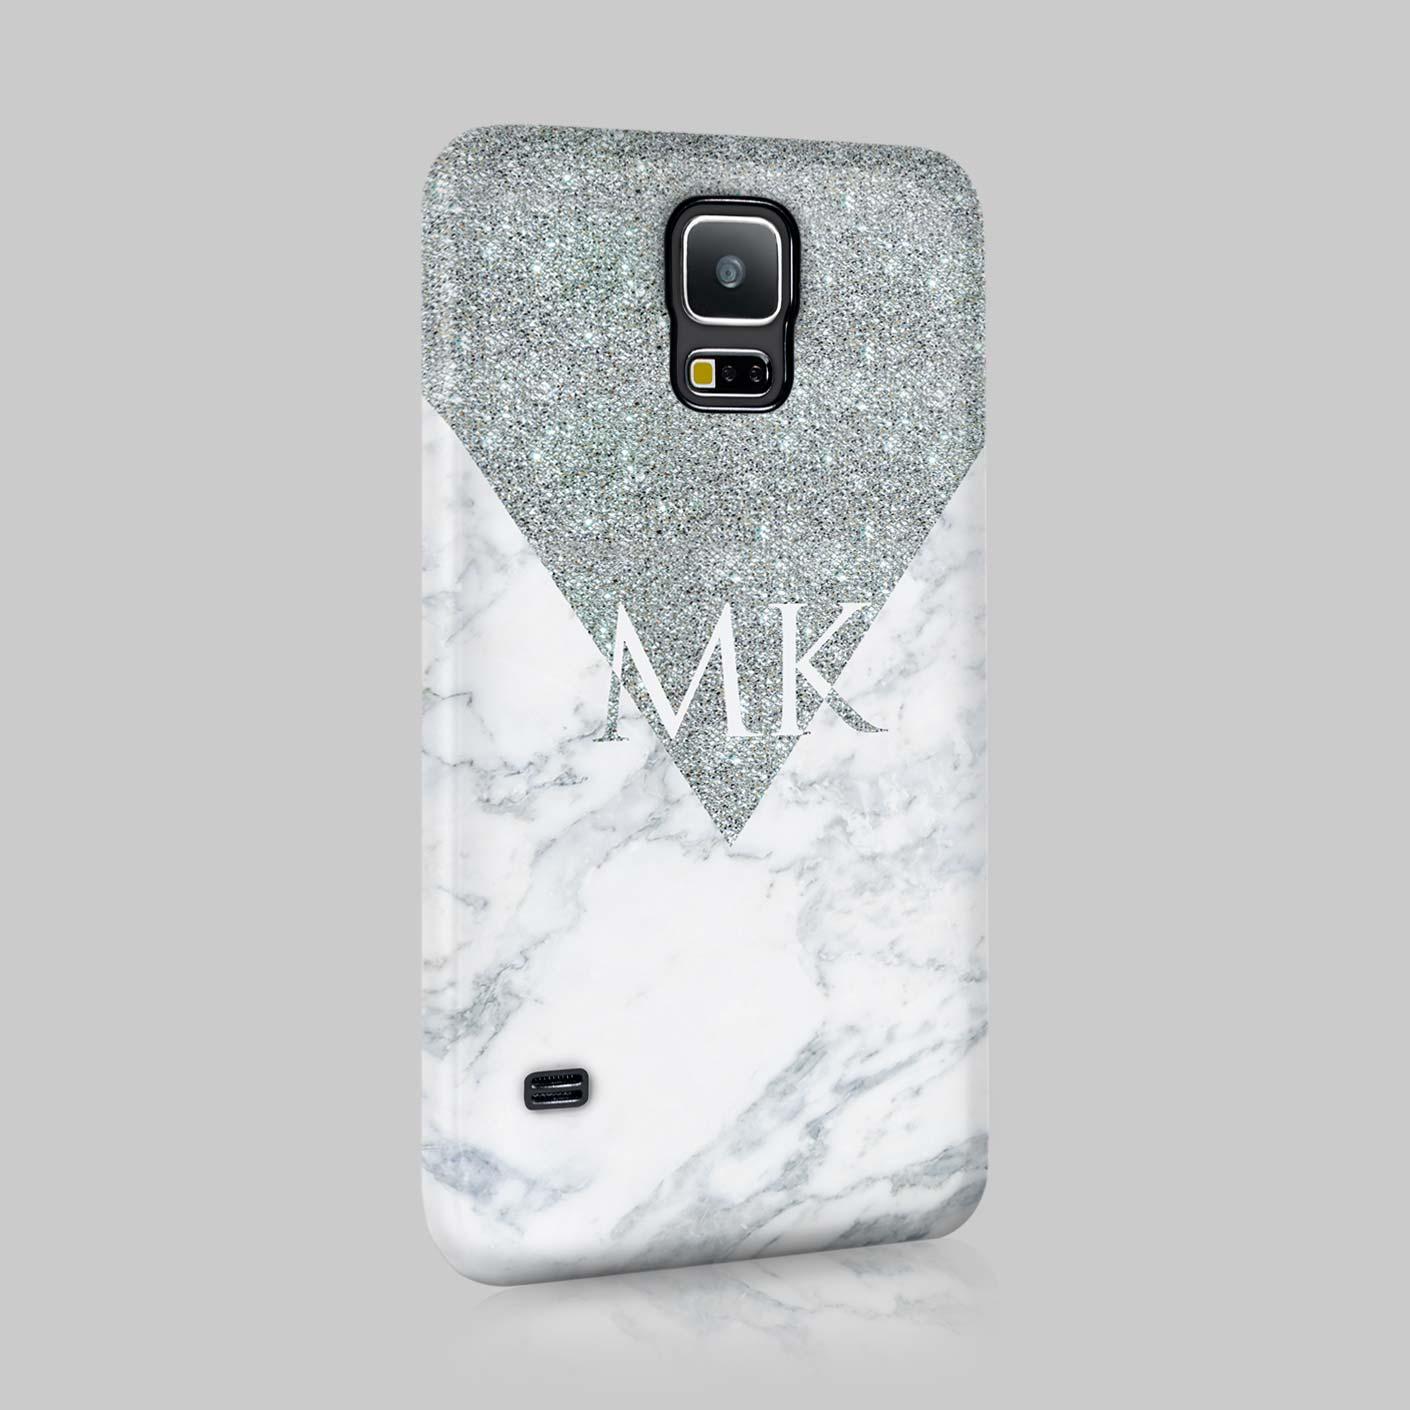 Personnalise-Argent-Marbre-Initiales-Custom-Etui-Coque-Pour-Samsung-Mini-Ace